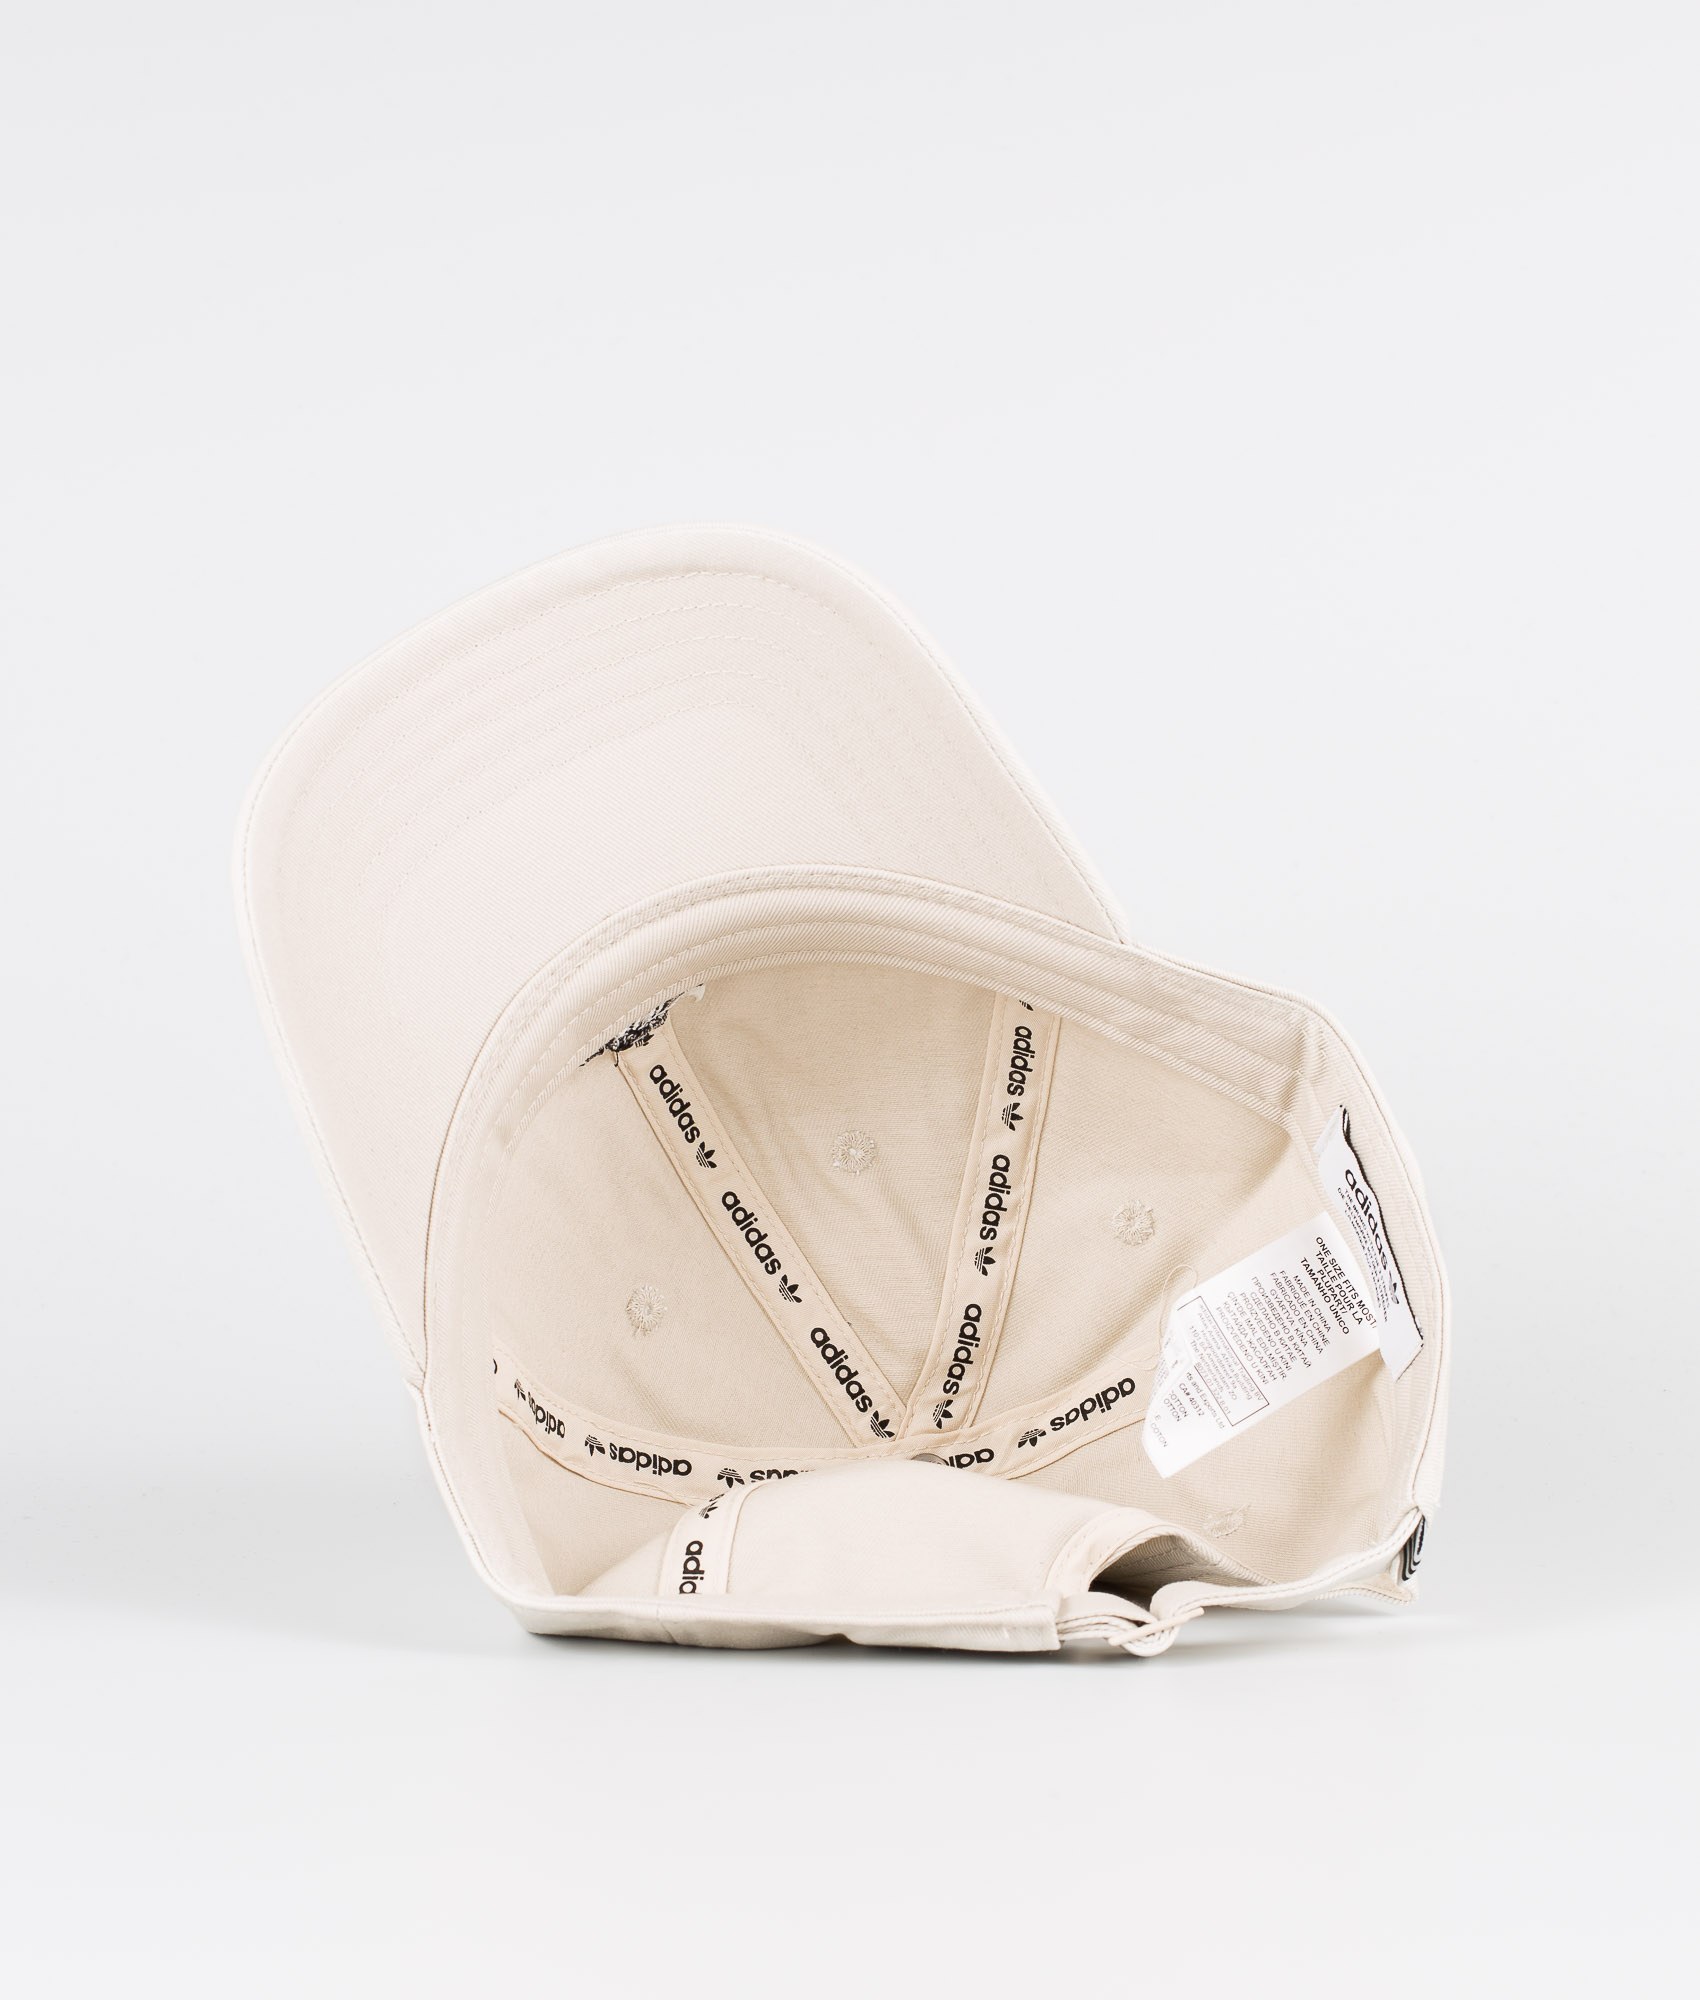 Adidas Originals Samba Caps Clear BrownBlack